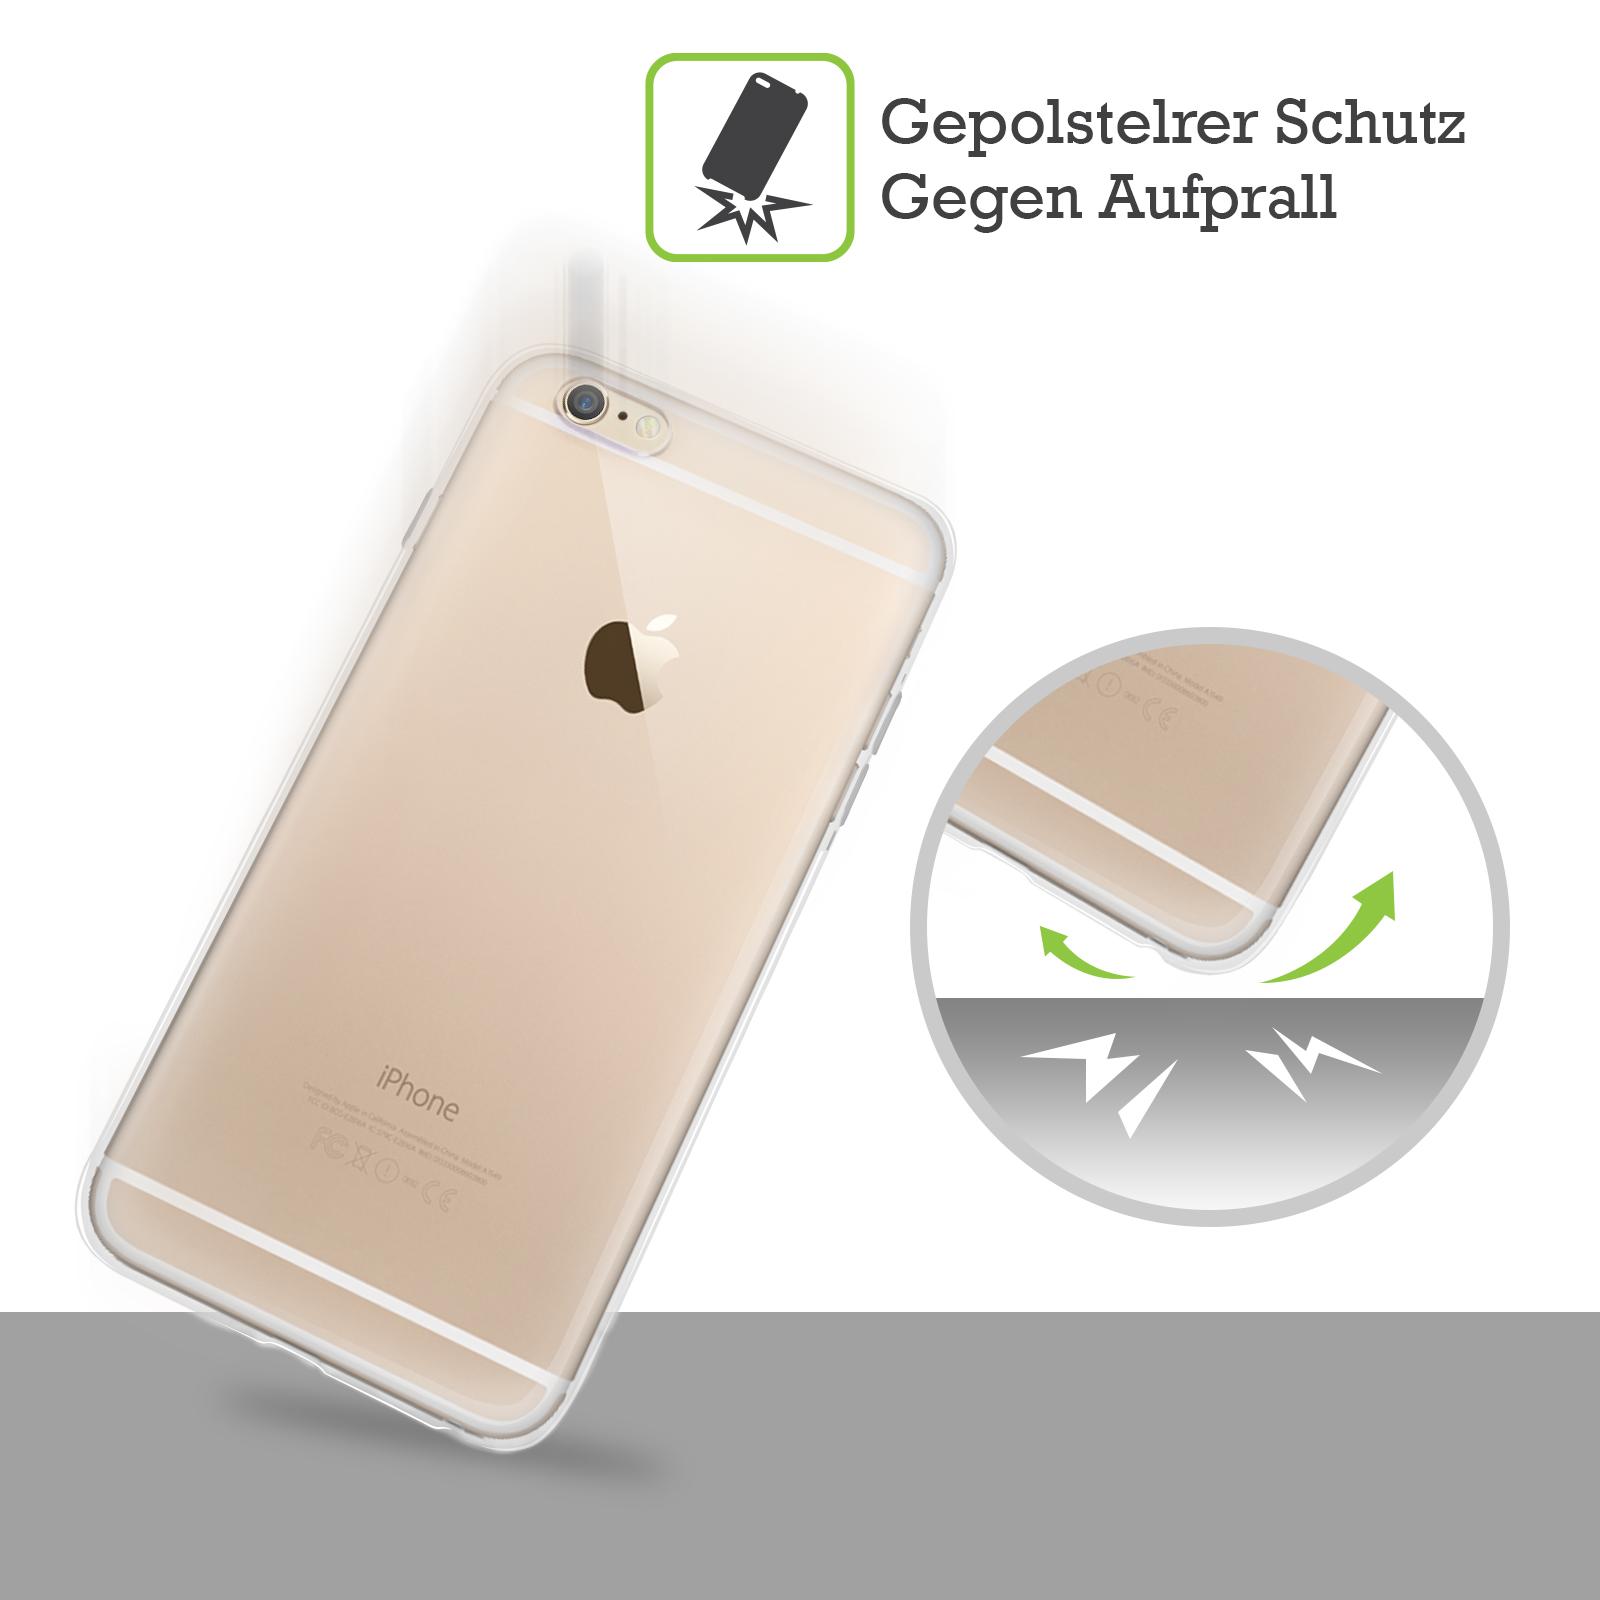 HEAD-CASE-DESIGNS-KOMPLEX-PAISLEY-SOFT-GEL-HULLE-FUR-APPLE-iPHONE-HANDYS